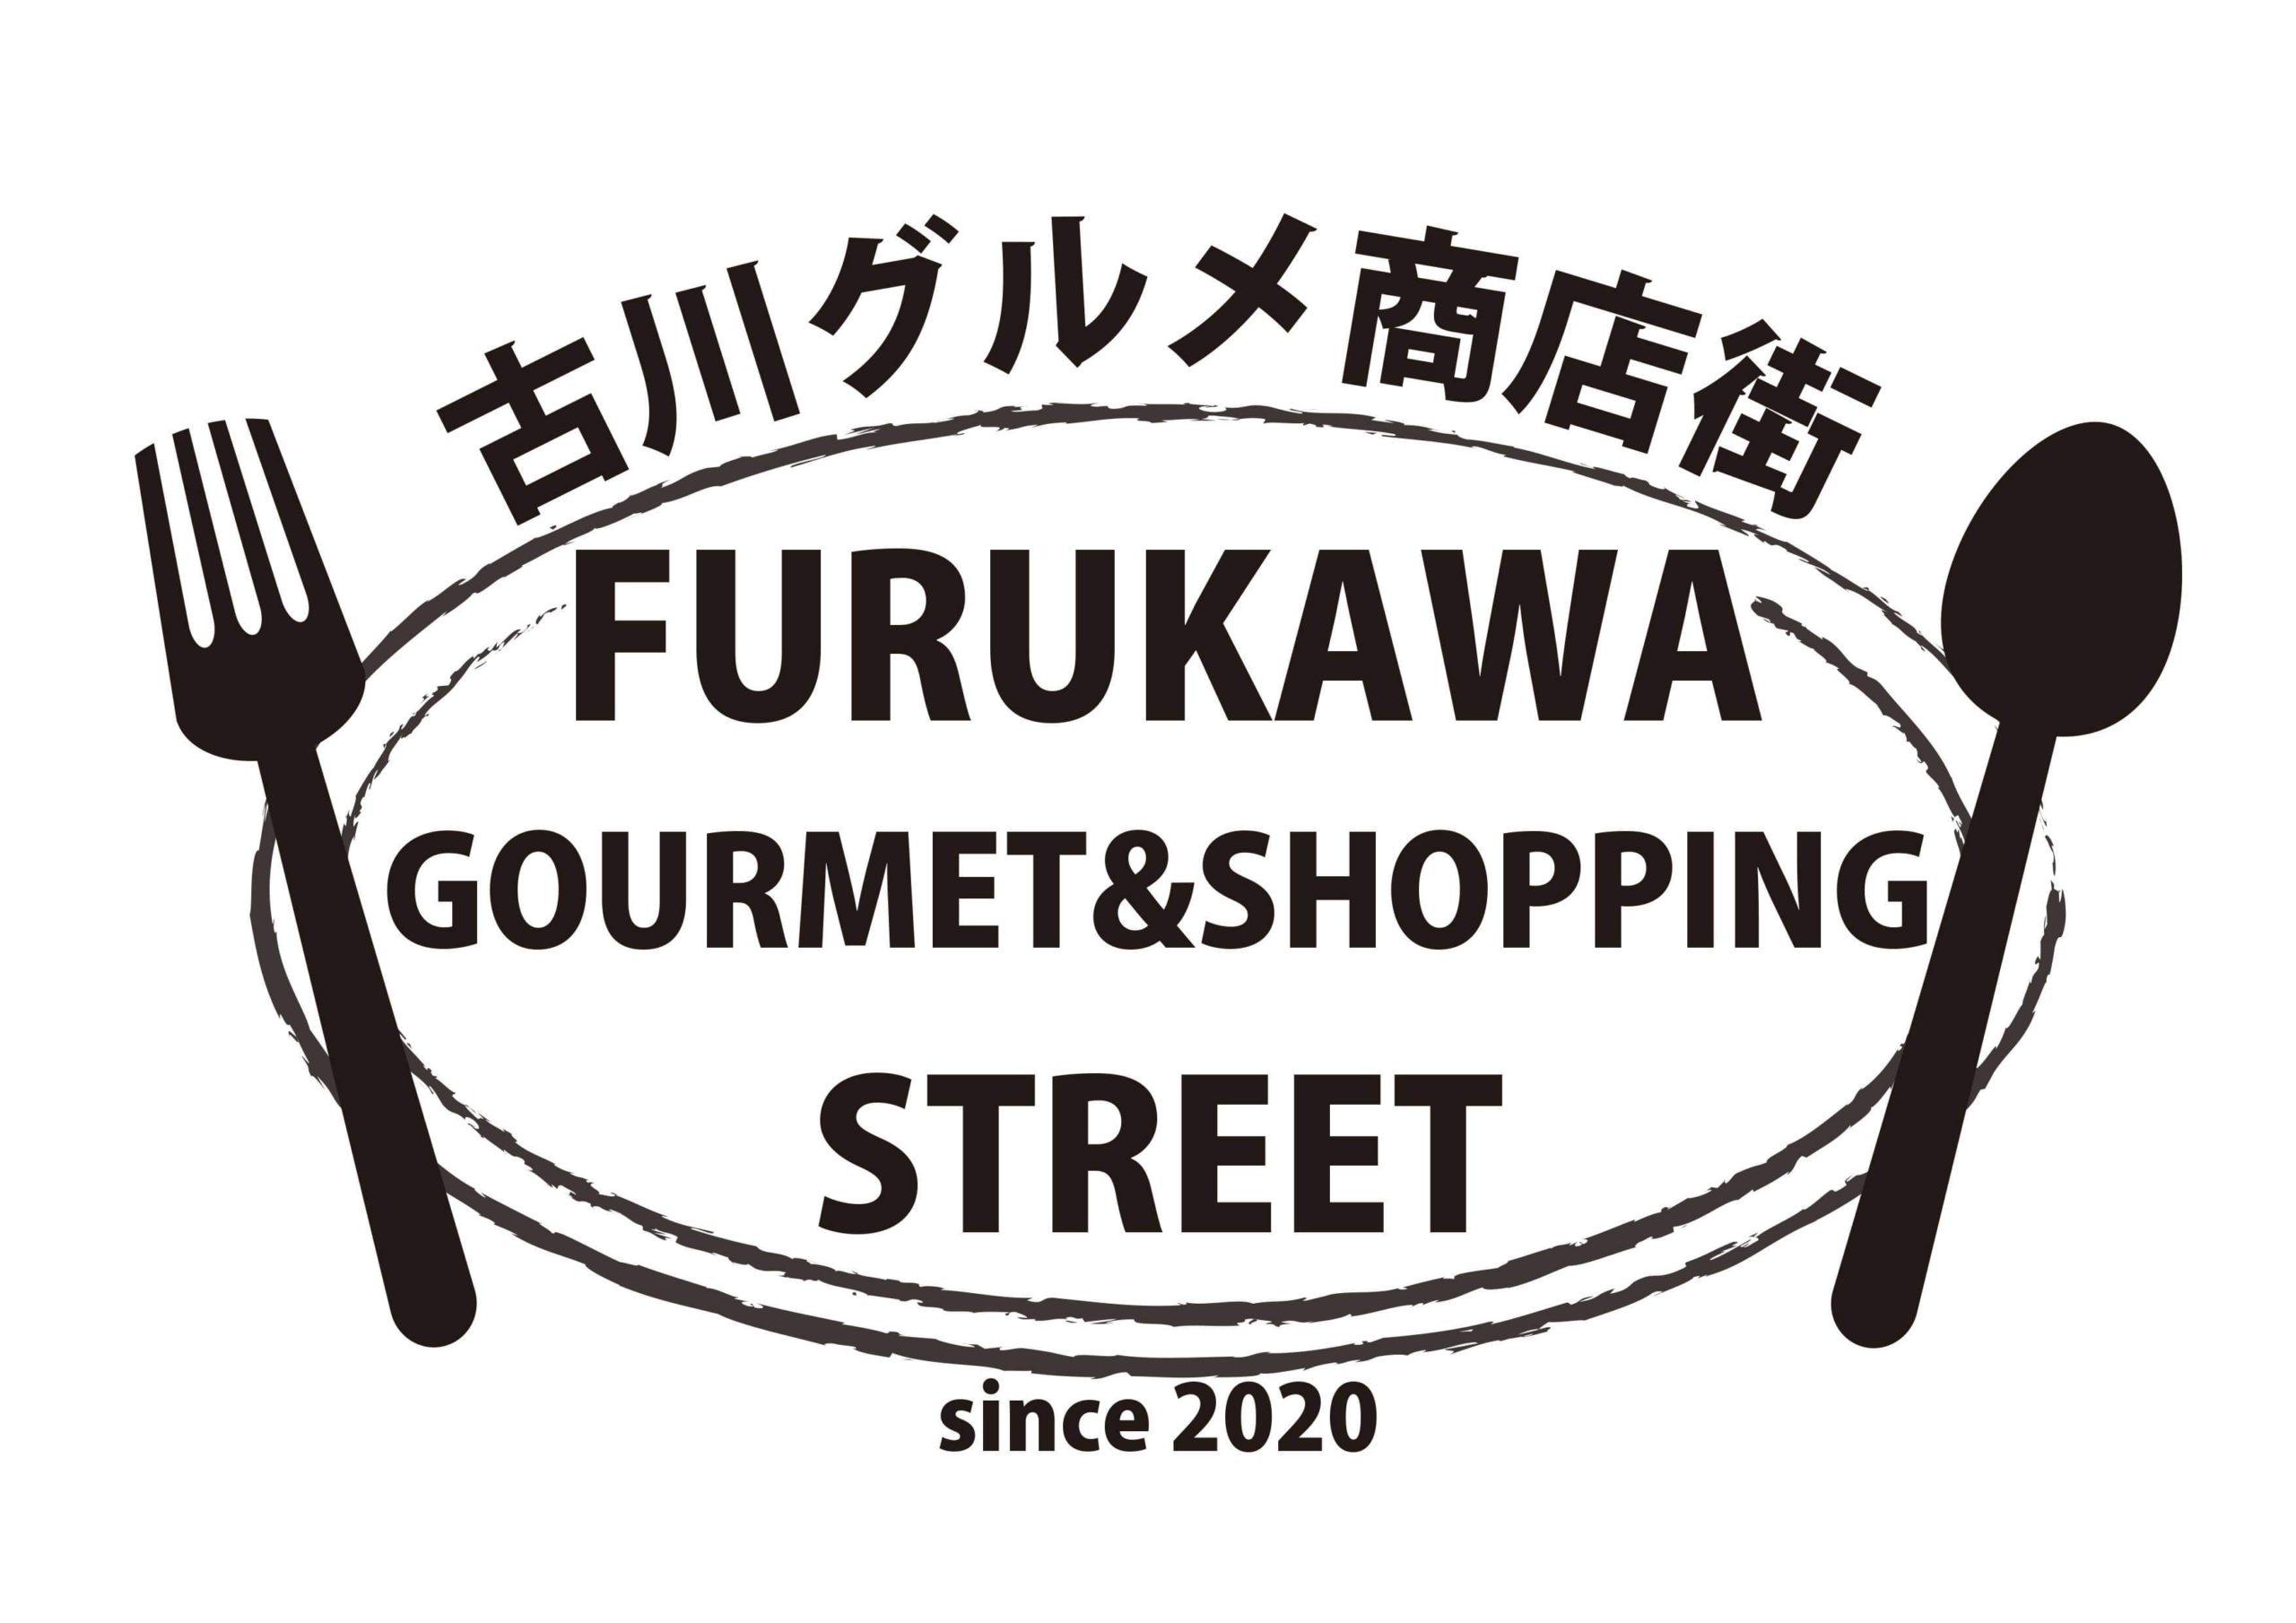 FURUKAWA GOURMET SHOPPING STREET